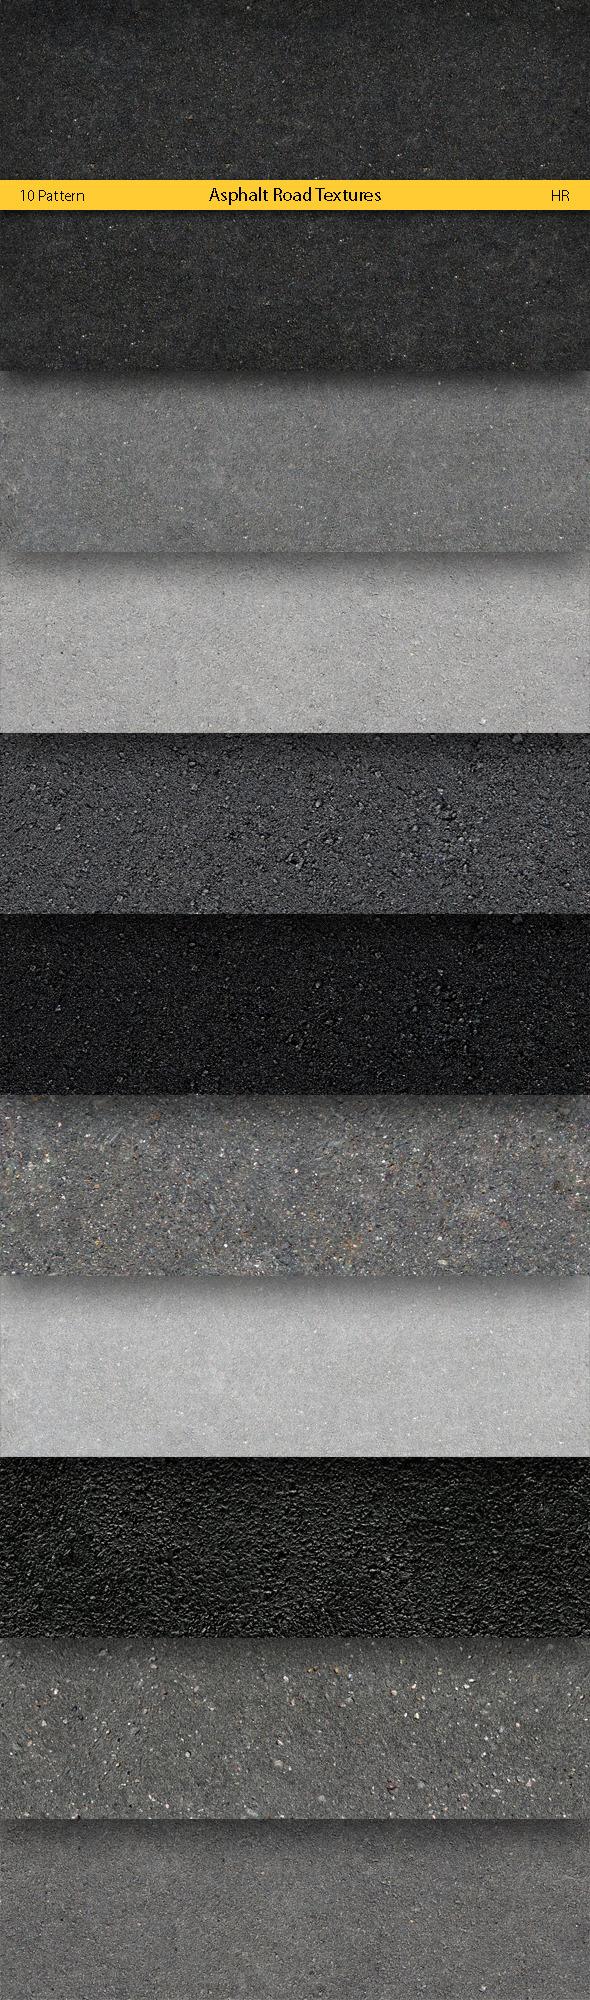 Asphalt Road Surface Textures - Urban Textures / Fills / Patterns